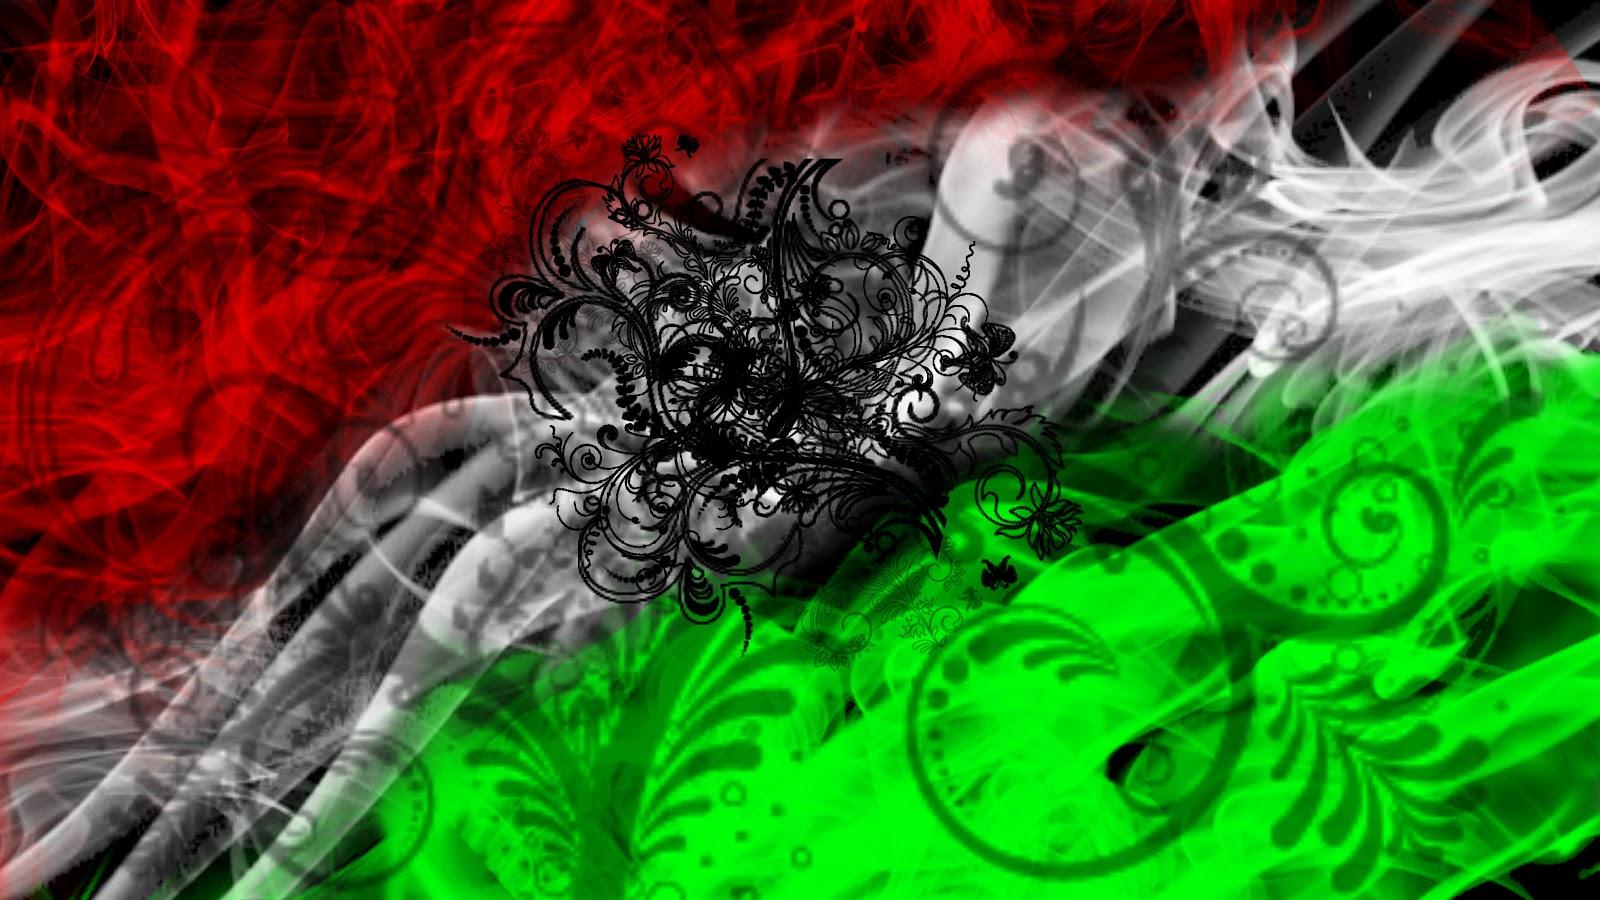 http://1.bp.blogspot.com/-TqlLqsReUmw/UCpOX1DmKoI/AAAAAAAAAUk/HIHb1v7xgZ0/s1600/flag+2.jpg